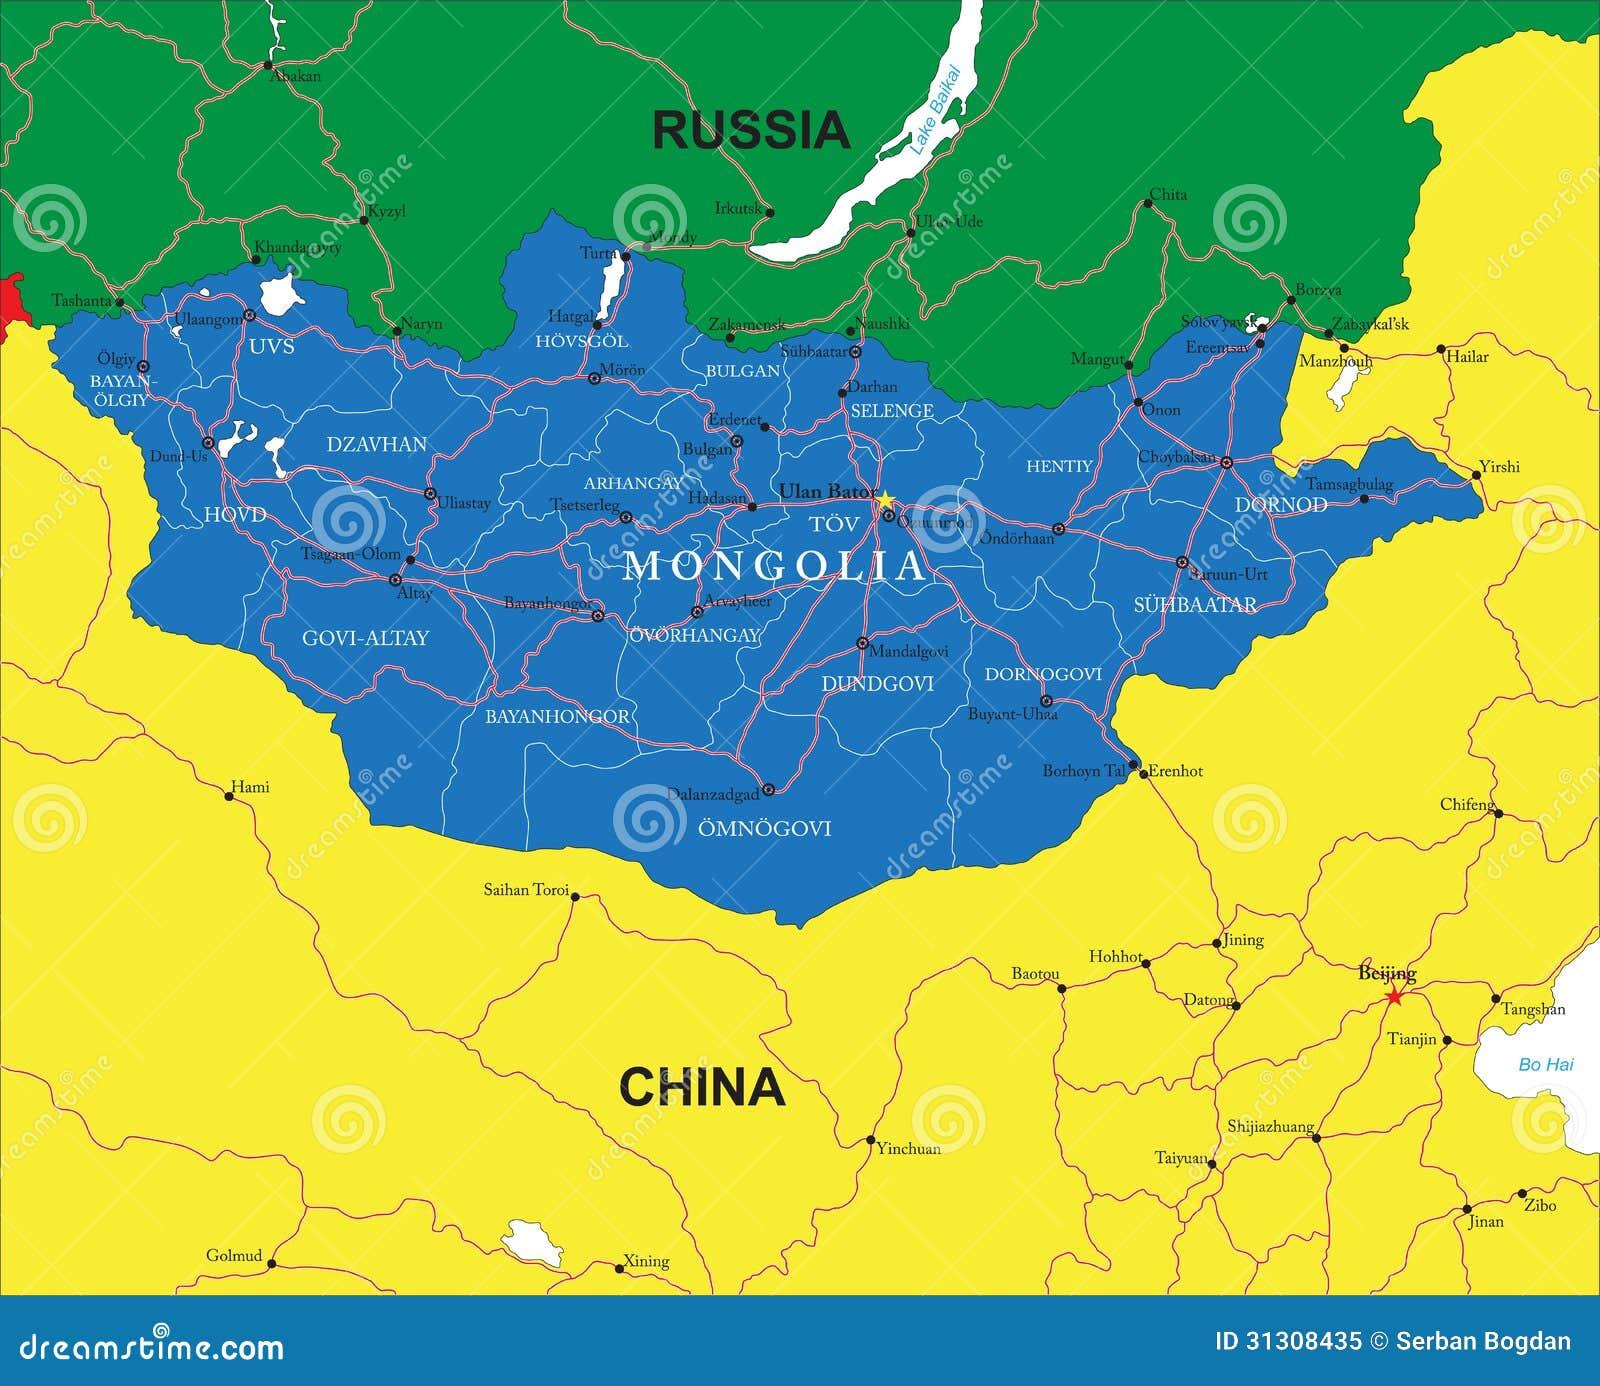 Mongolia map stock vector illustration of nation baikal 31308435 mongolia map publicscrutiny Gallery